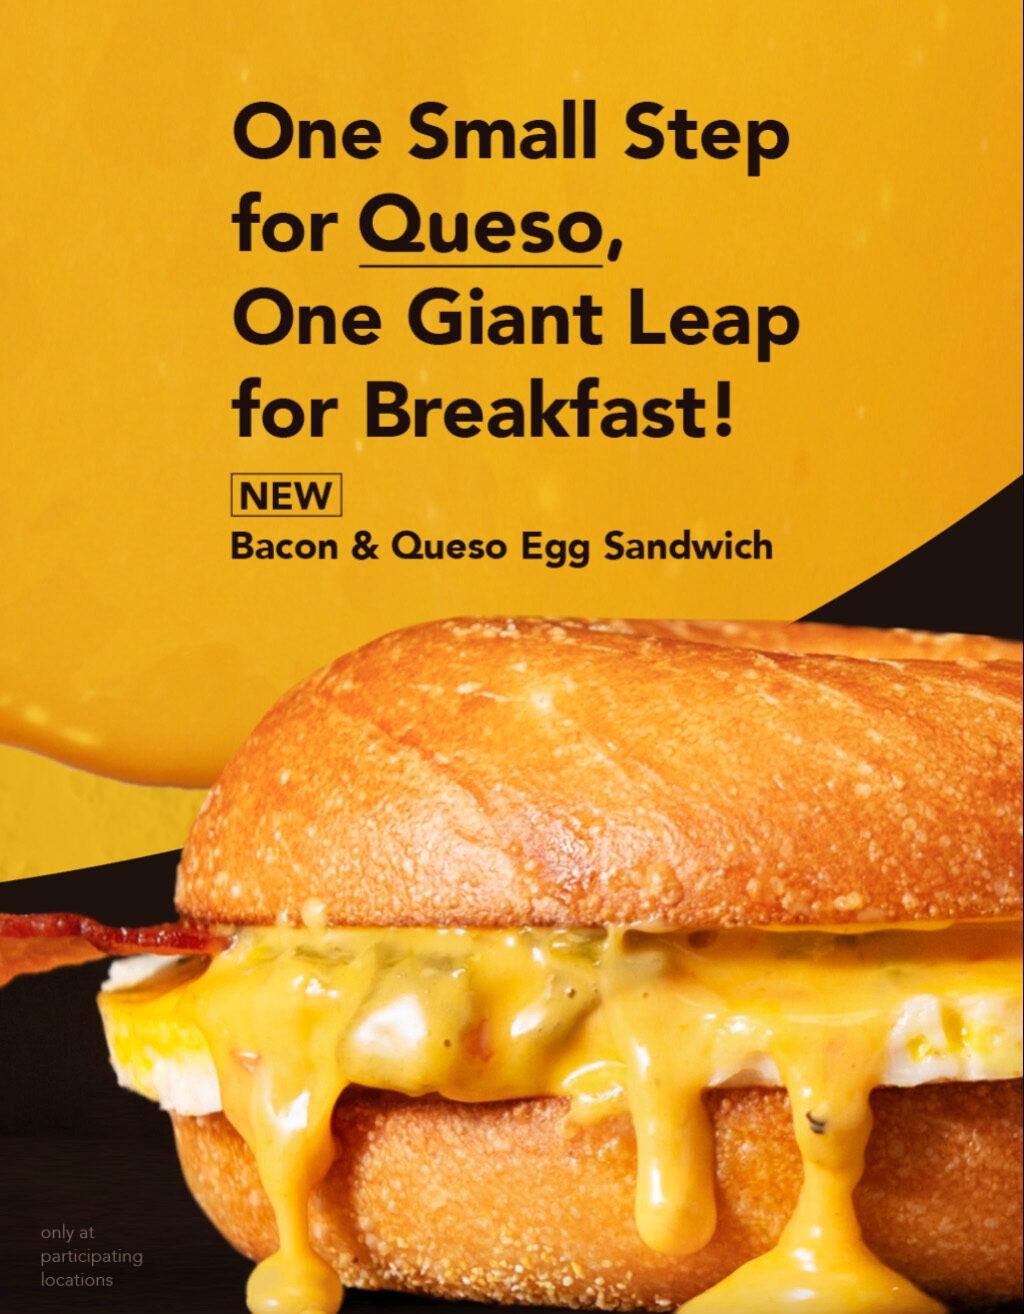 Bacon and Queso Egg Sandwich Einstein Bros. Bagels Mobile Slider